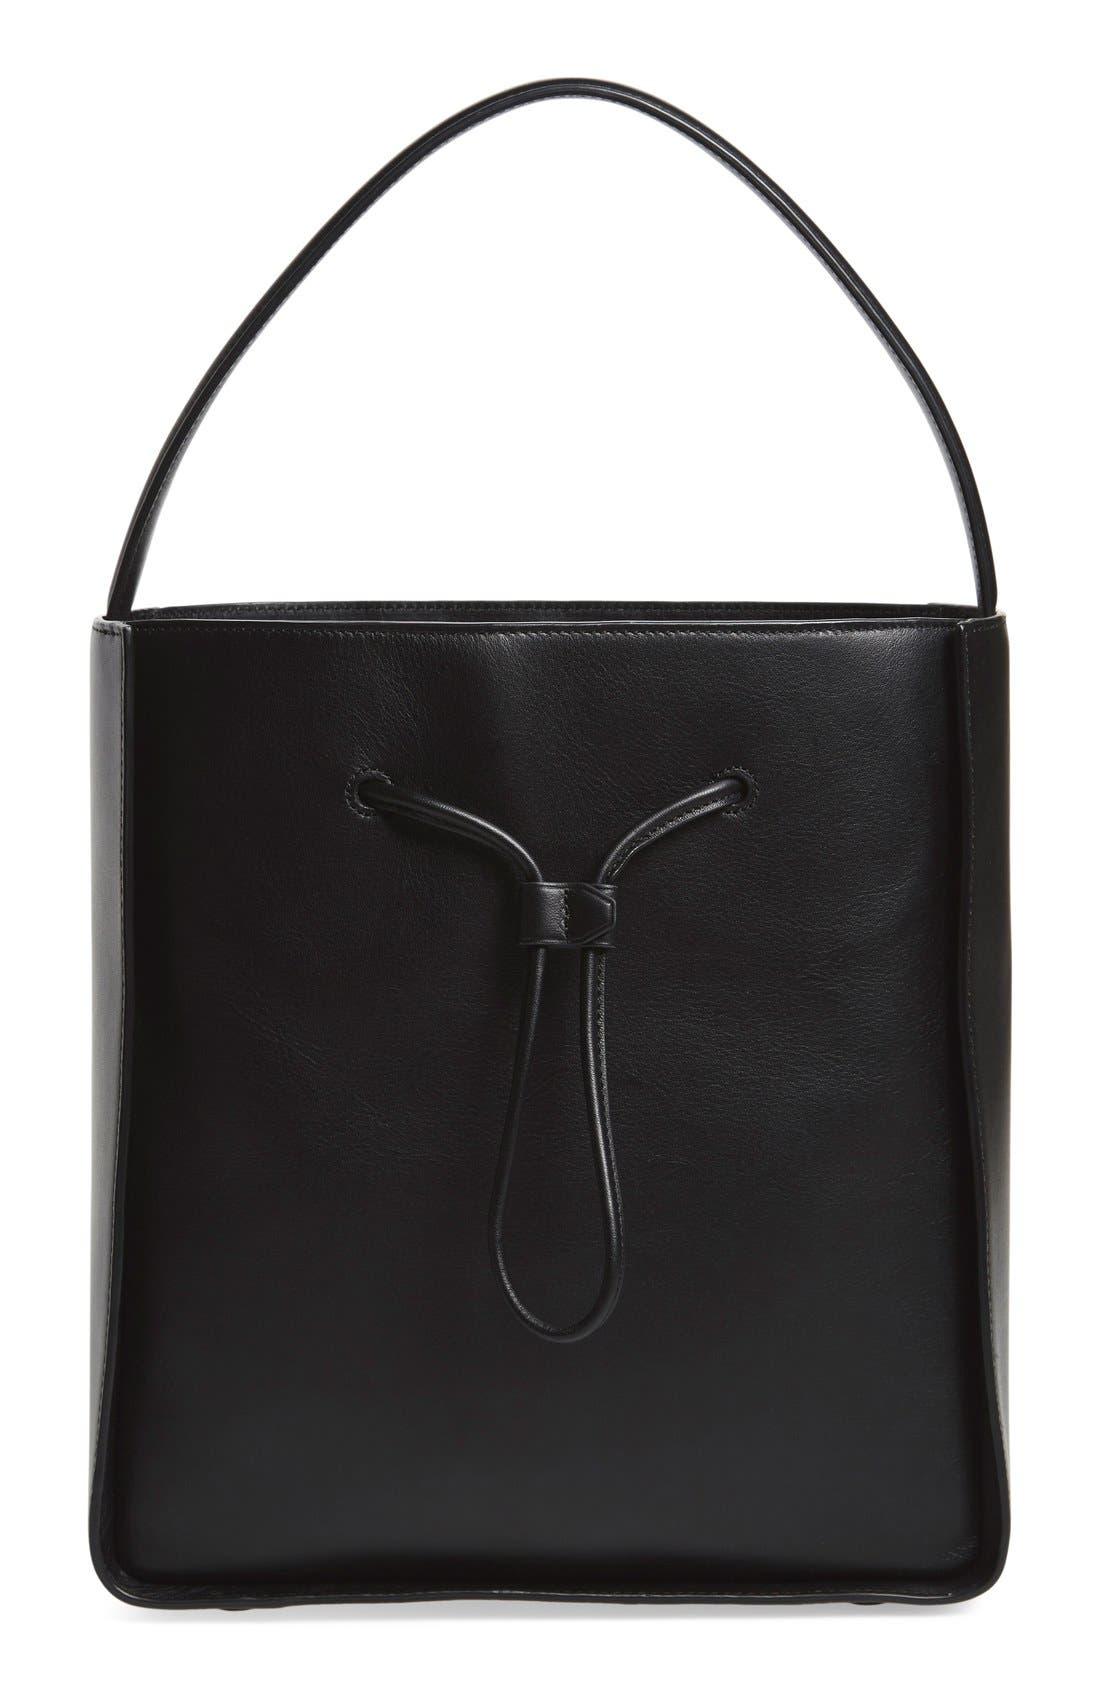 3.1 PHILLIP LIM 'Large Soleil' Bucket Bag